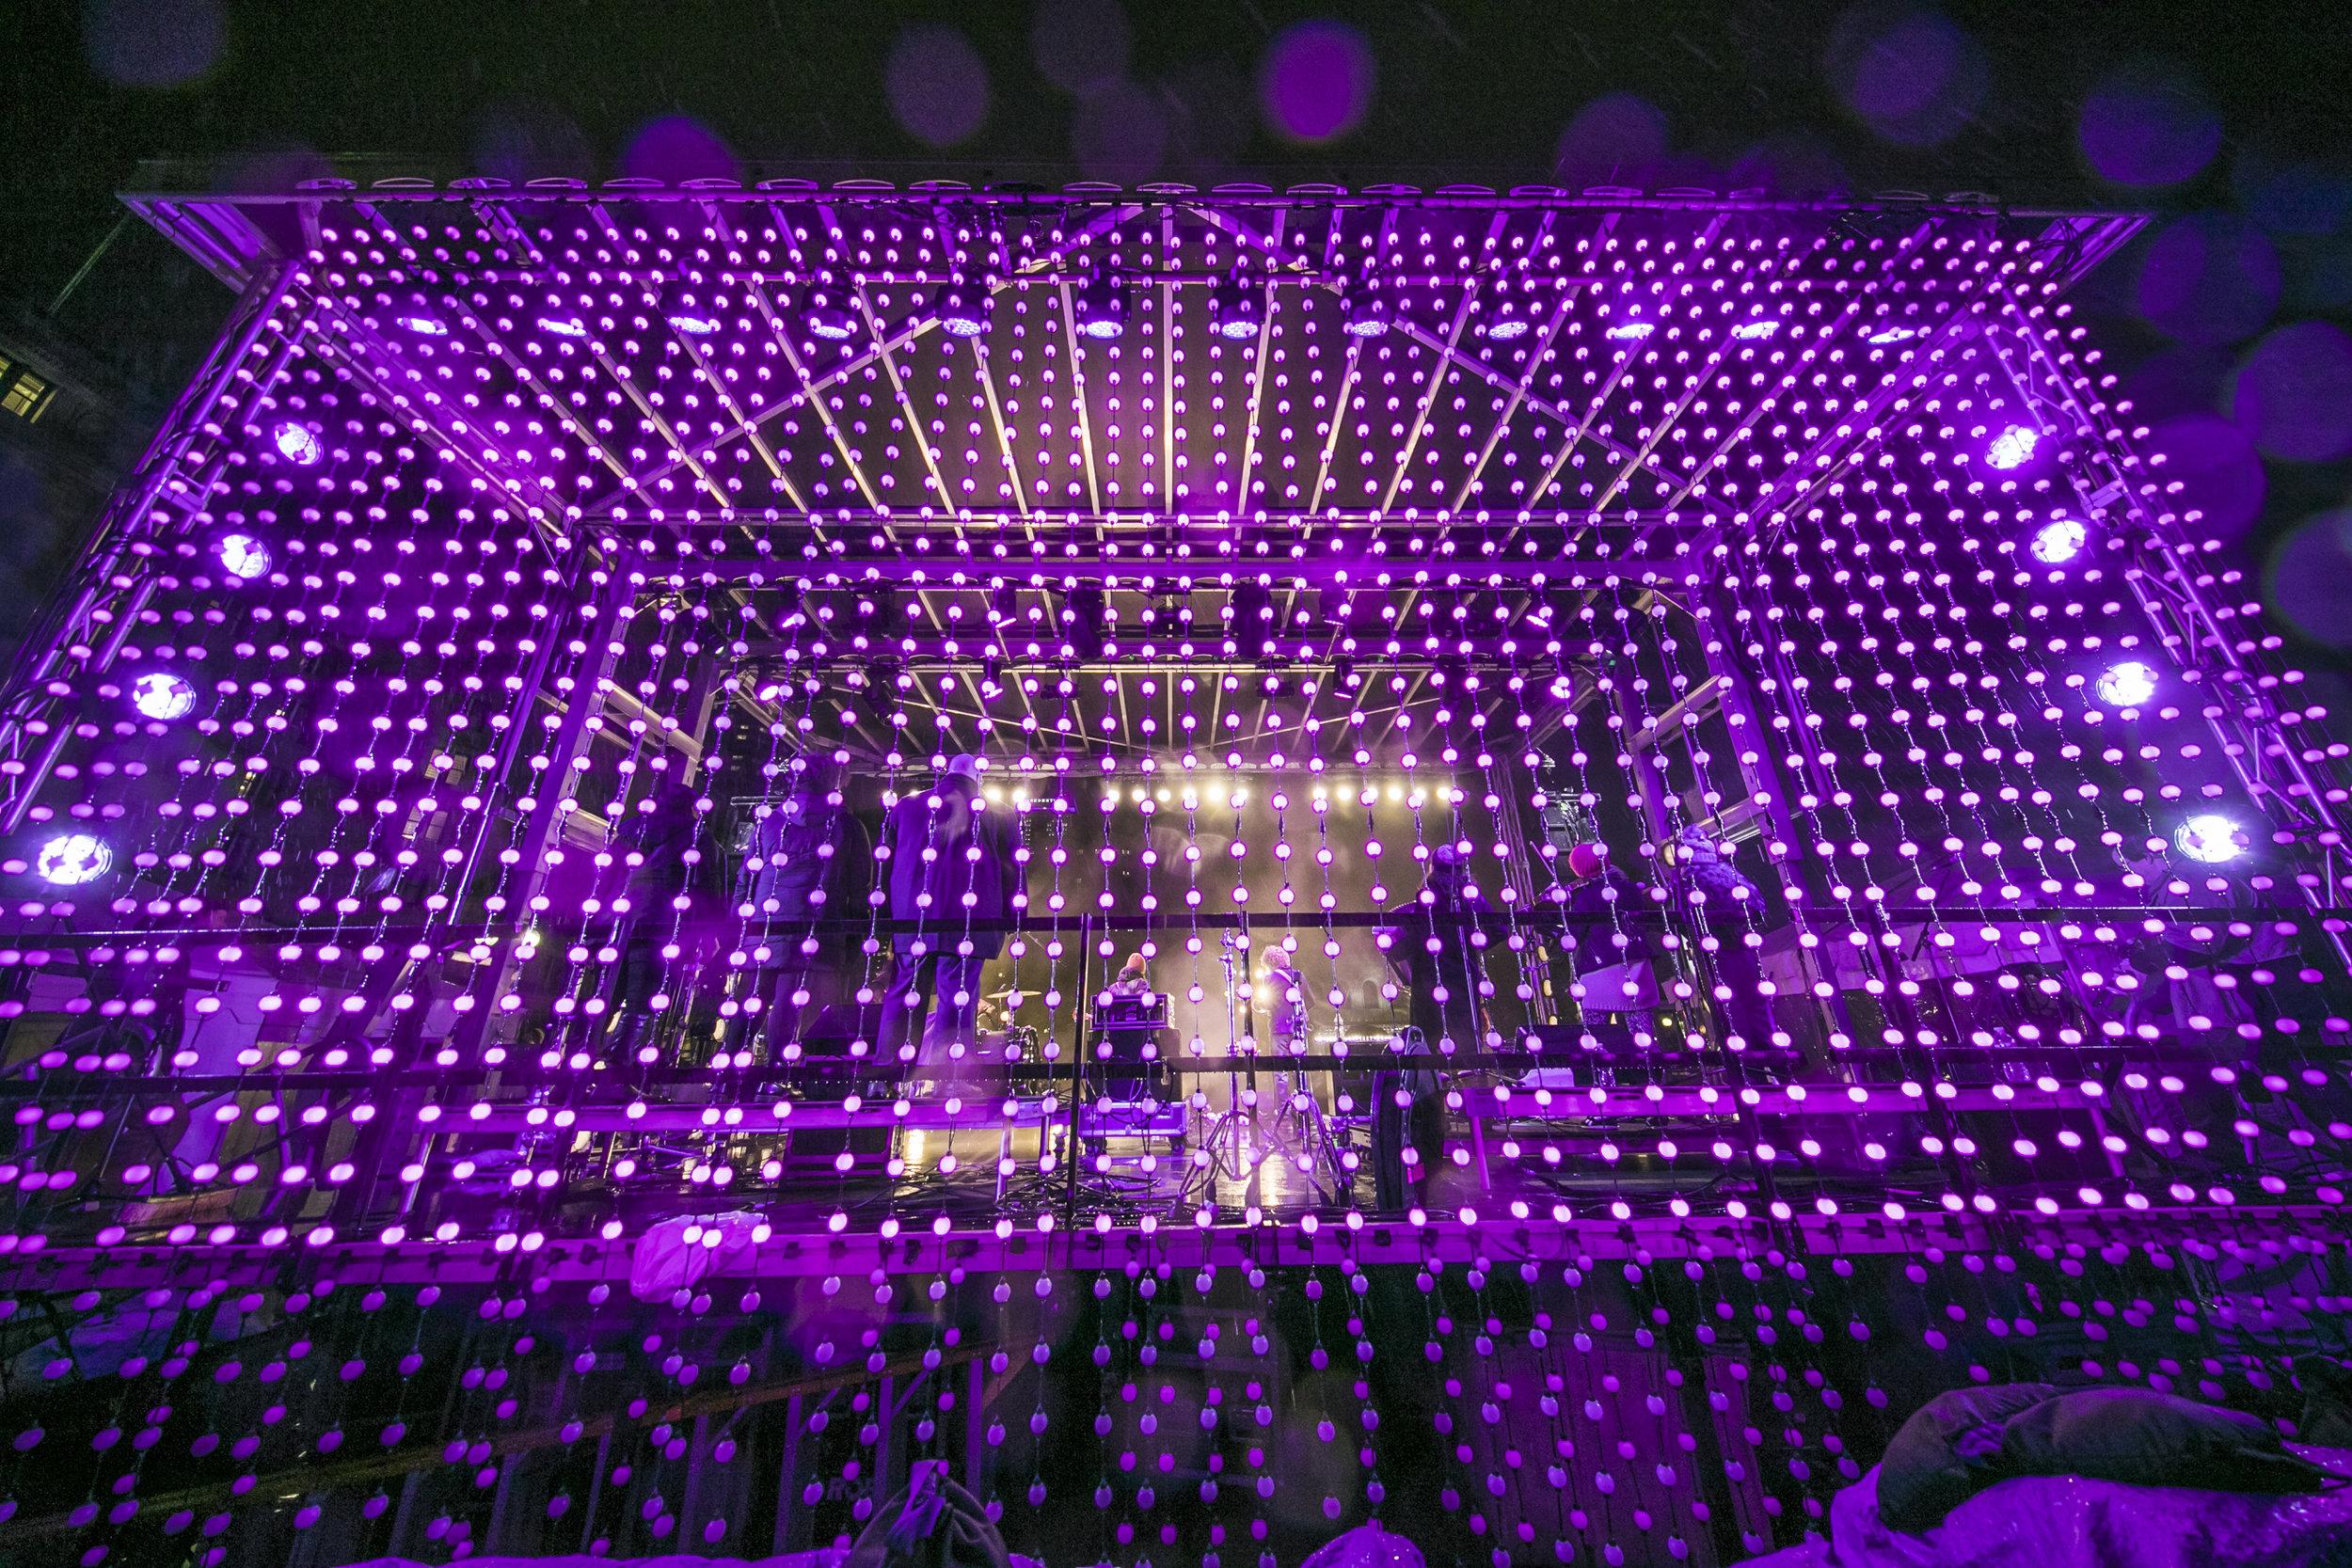 Copley Square Concert Mainstage Minlion Light Backdrop Port Lighting First Night Boston 2019 .jpg